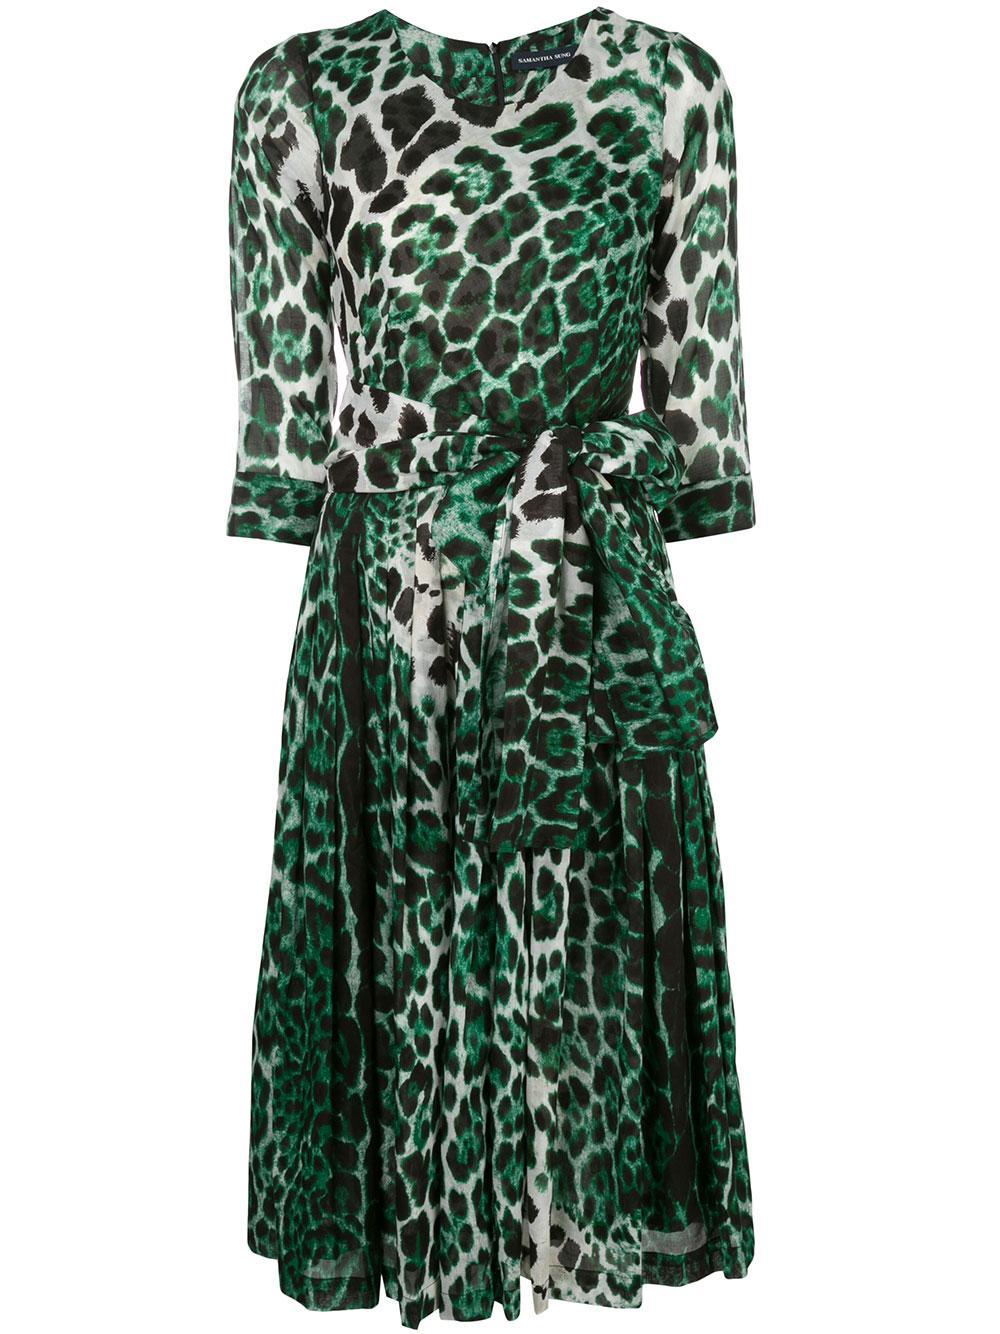 Florane Crew Neck 3/4 Sleeve Dress